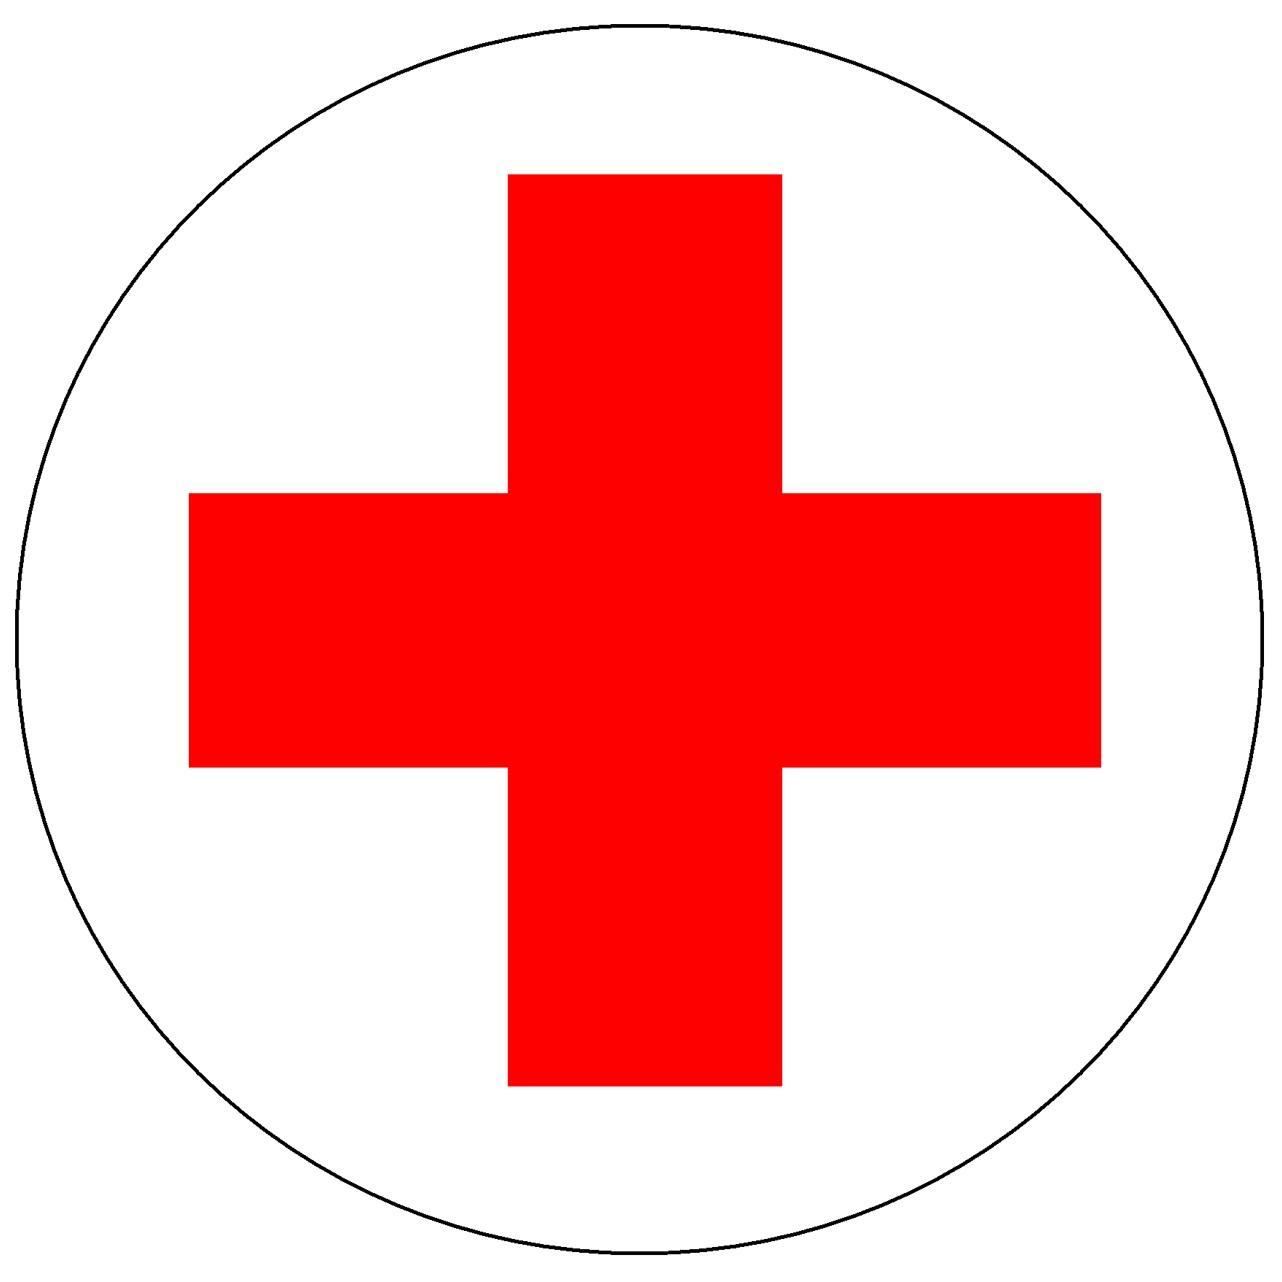 American-Red-Cross-emblem.jpg